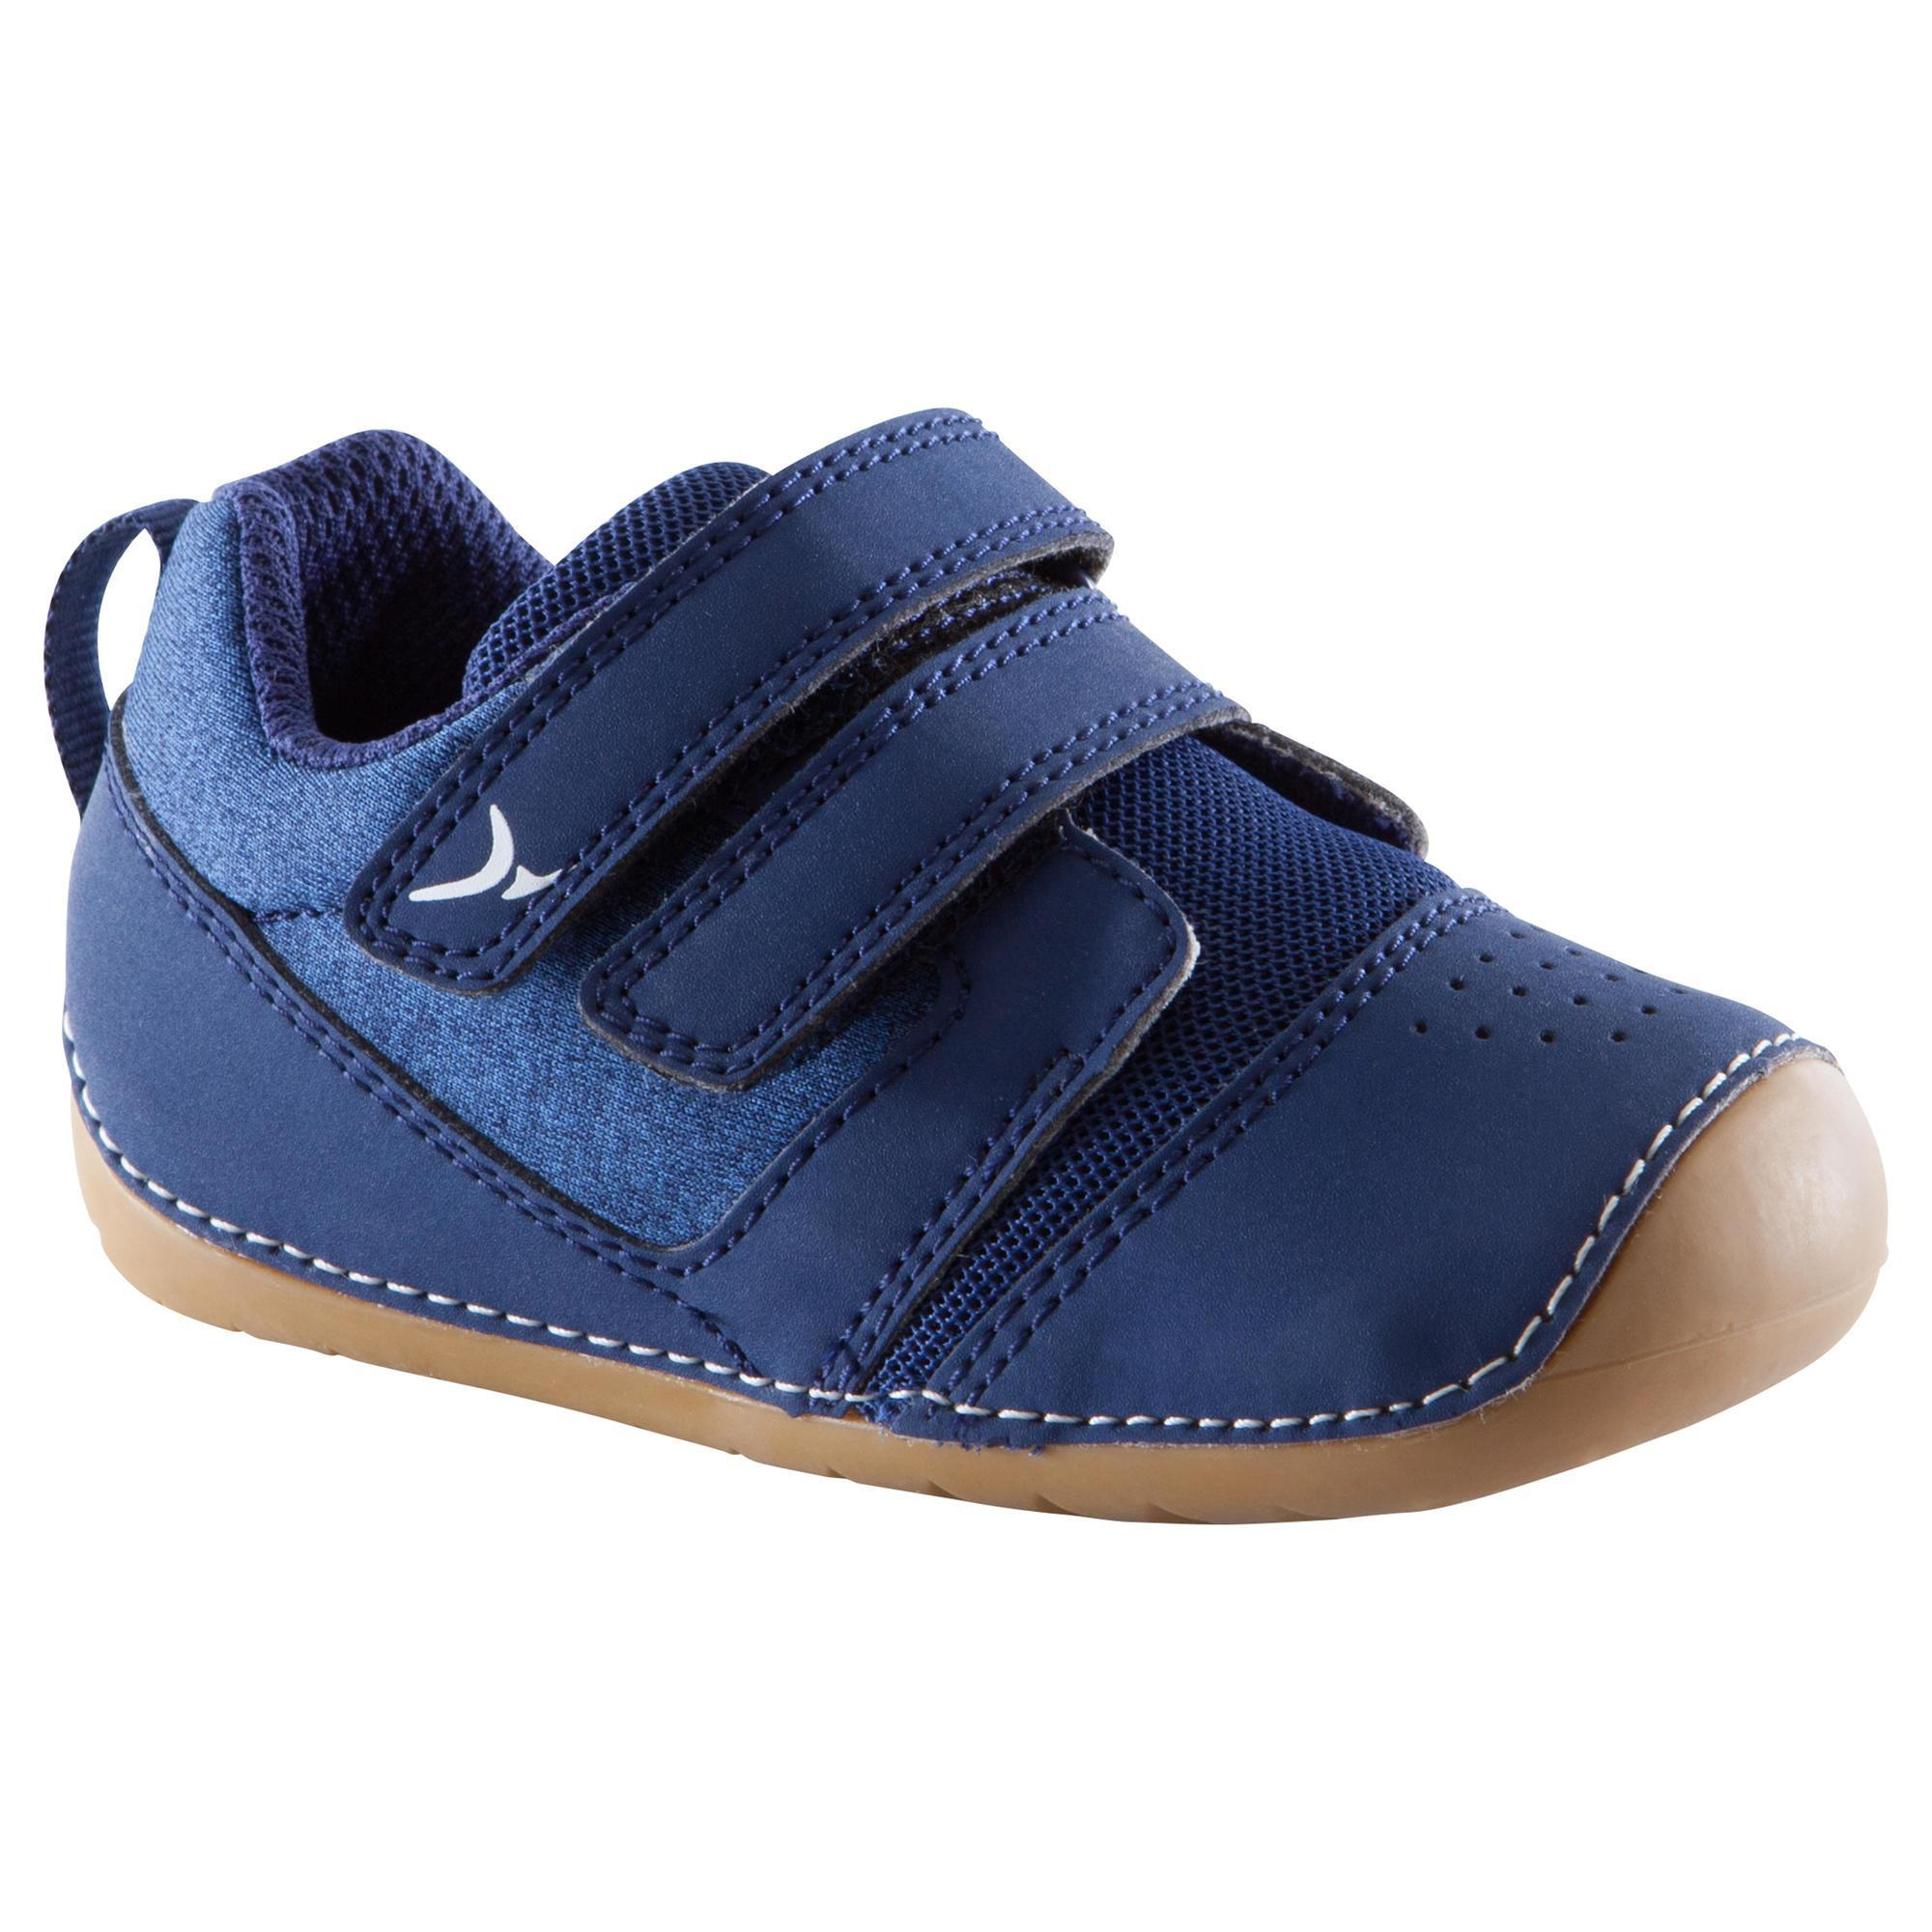 Baby,Kinder,Jungen,Kinder Turnschuhe 500 I Learn Gym Baby marineblau/braun | 03608419312393